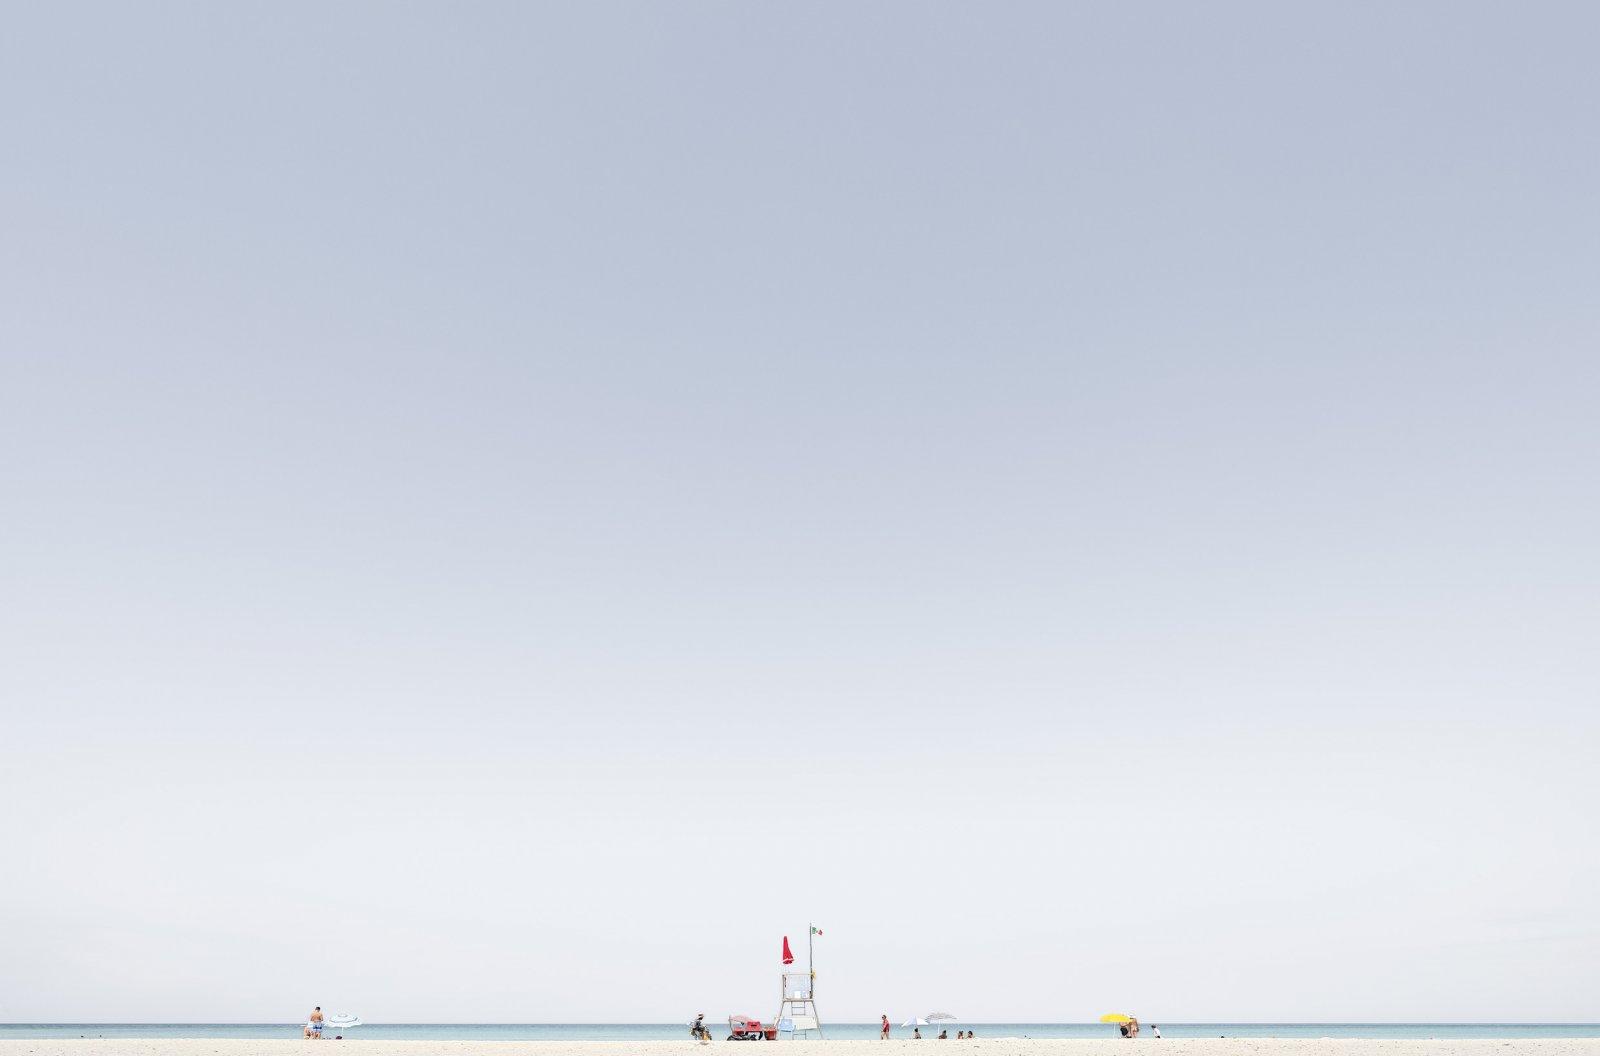 Spiagge bianche, Italie, 2017 © Luca Lupi